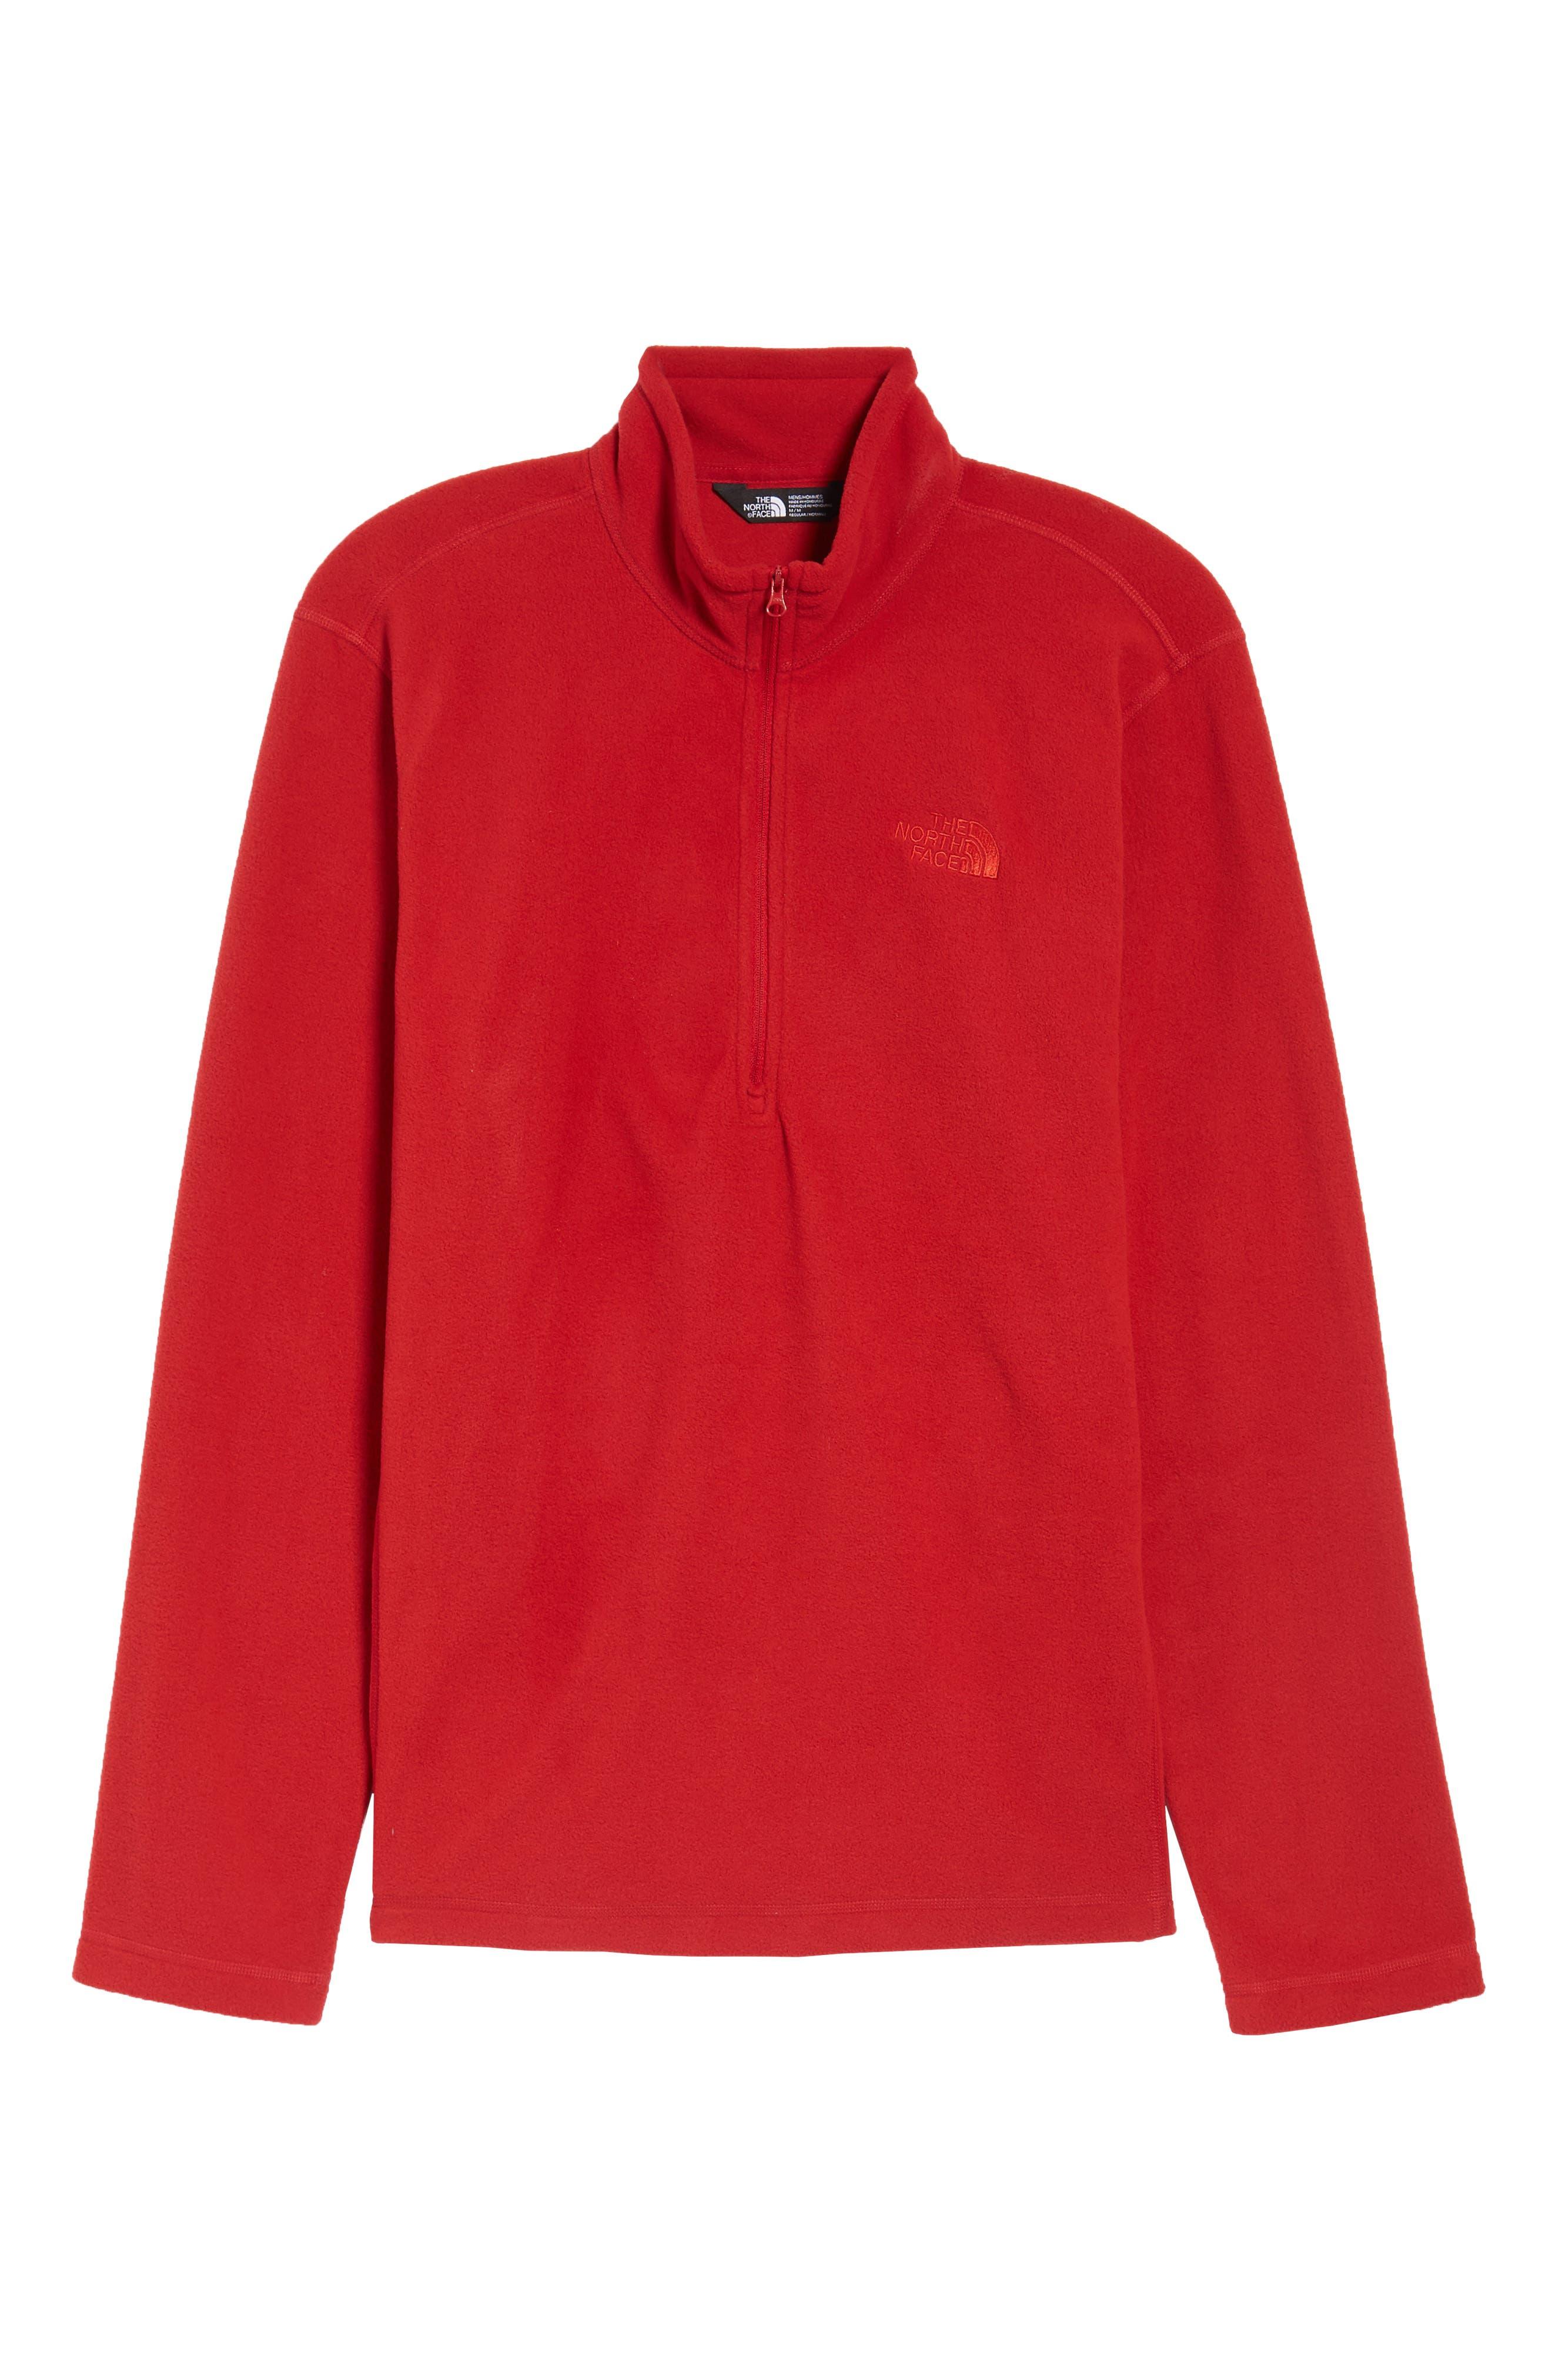 'TKA 100 Glacier' Quarter Zip Fleece Pullover,                             Alternate thumbnail 6, color,                             RAGE RED/ RAGE RED